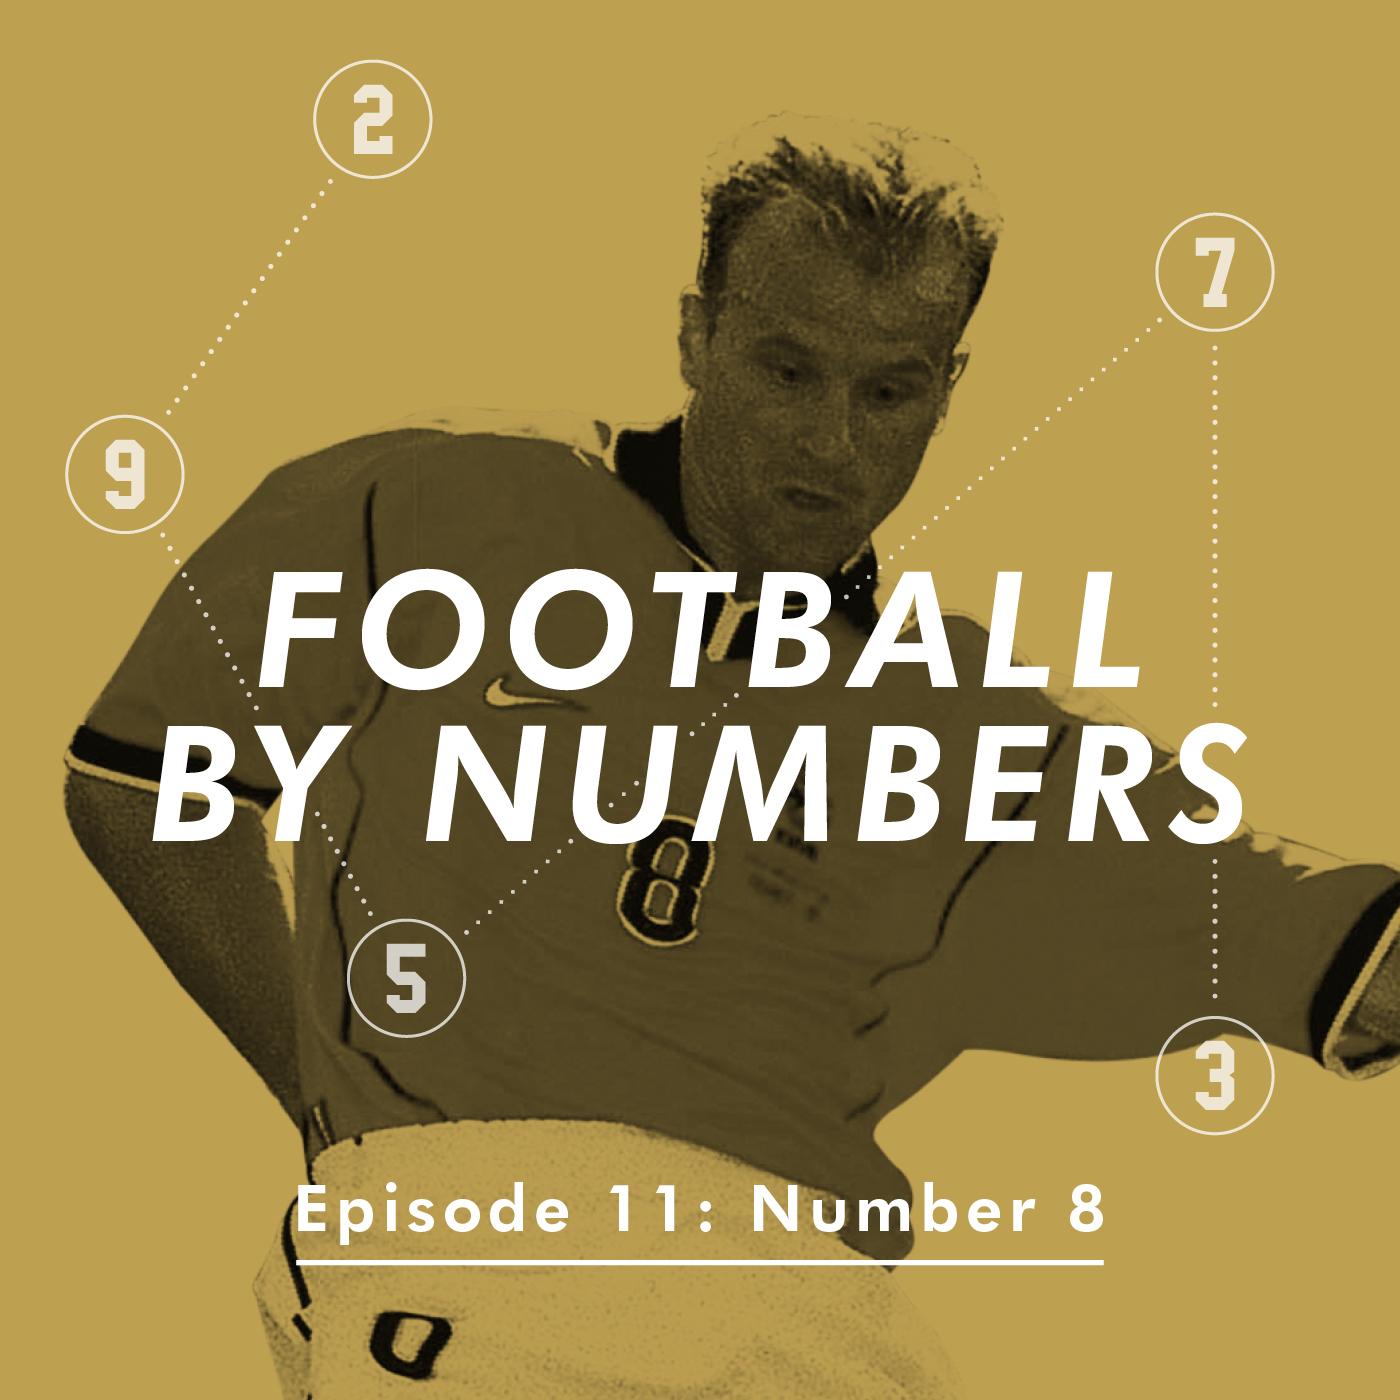 FootballByNumbers-Covers-E11.jpg